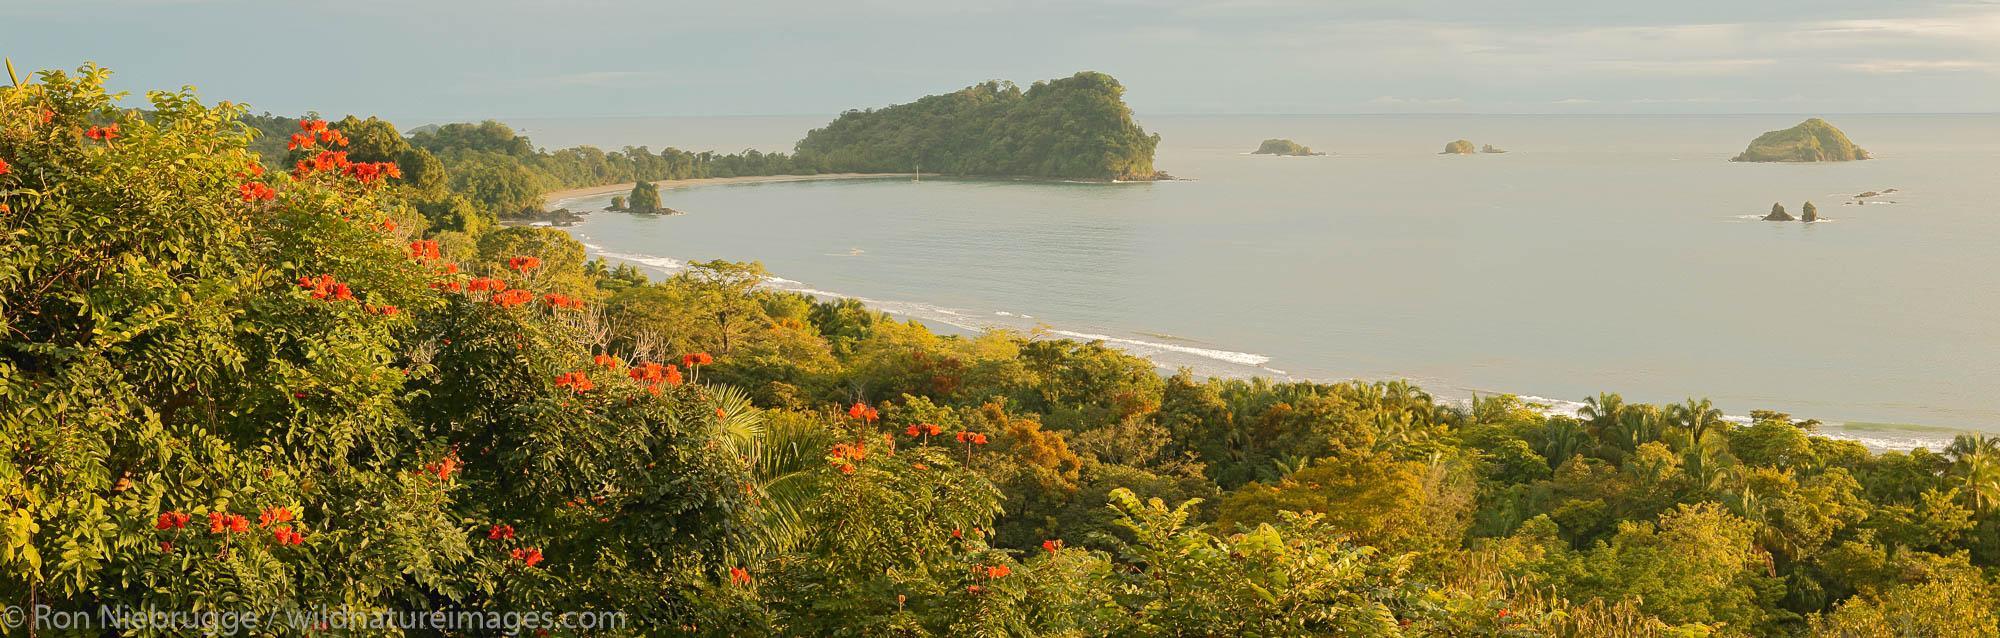 Costa Rica, photos, Manuel Antonio National Park , photo